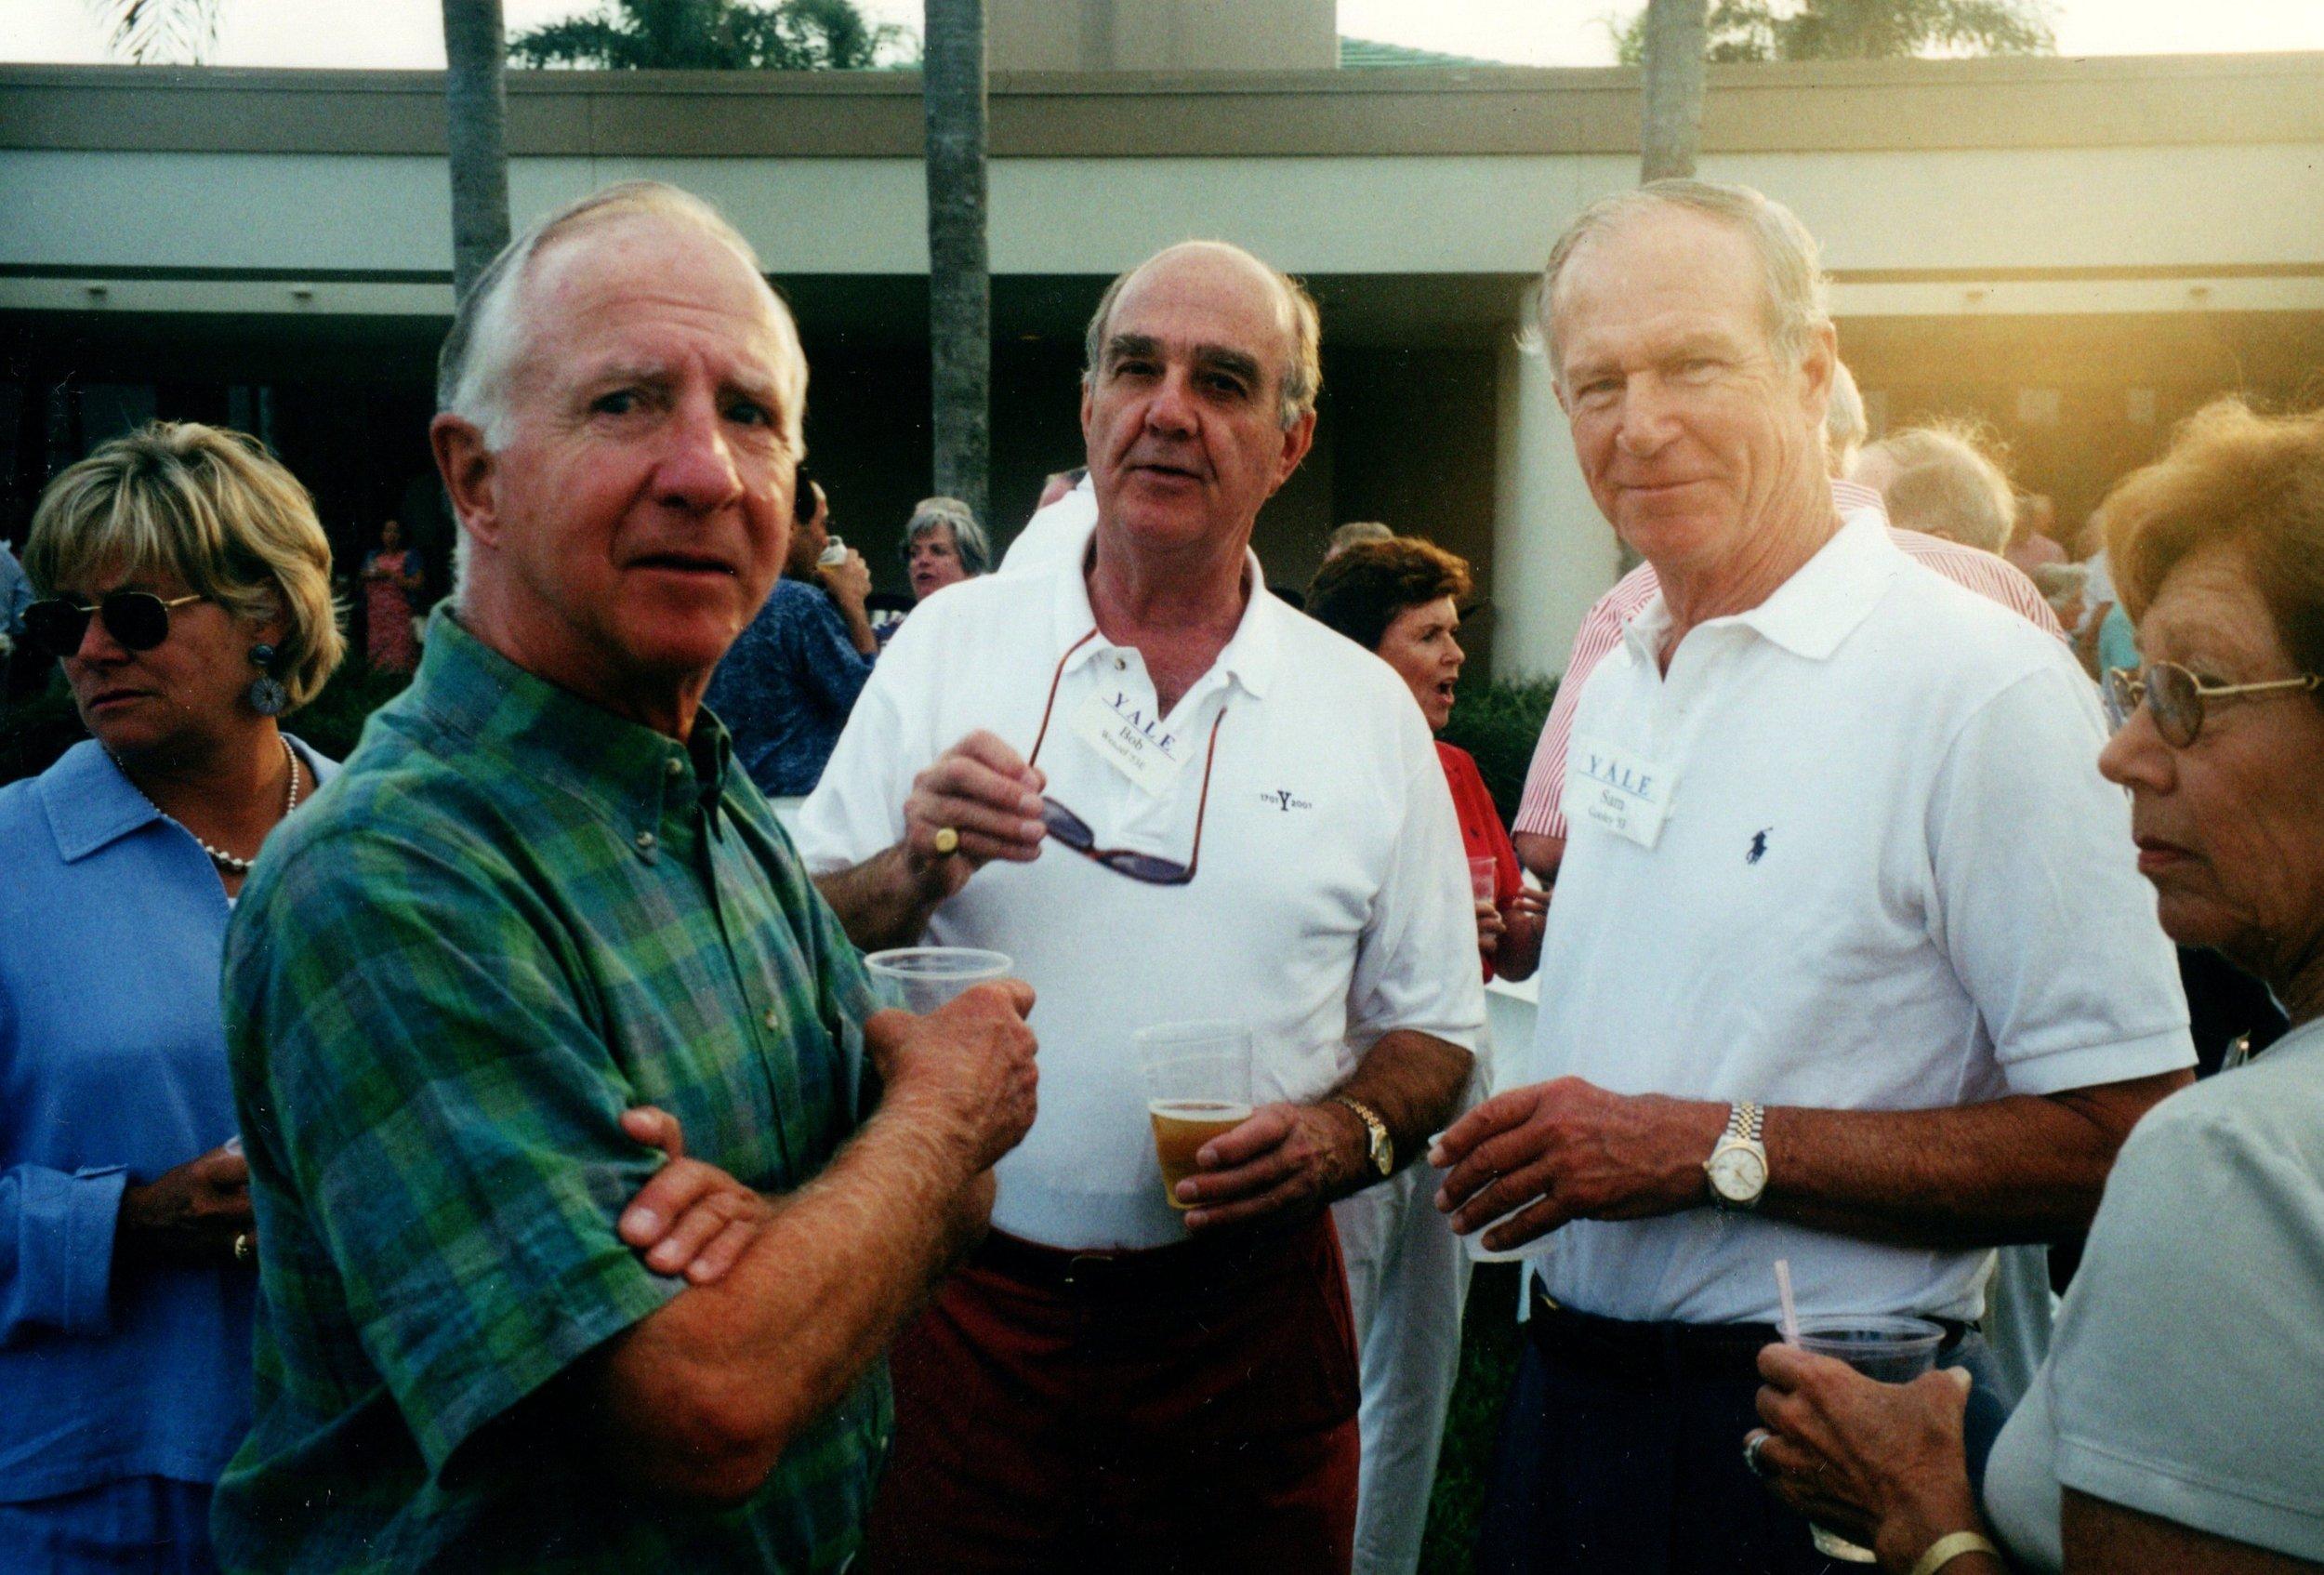 DON WILLIAMS, BOB WENZEL, SAM COOLEY